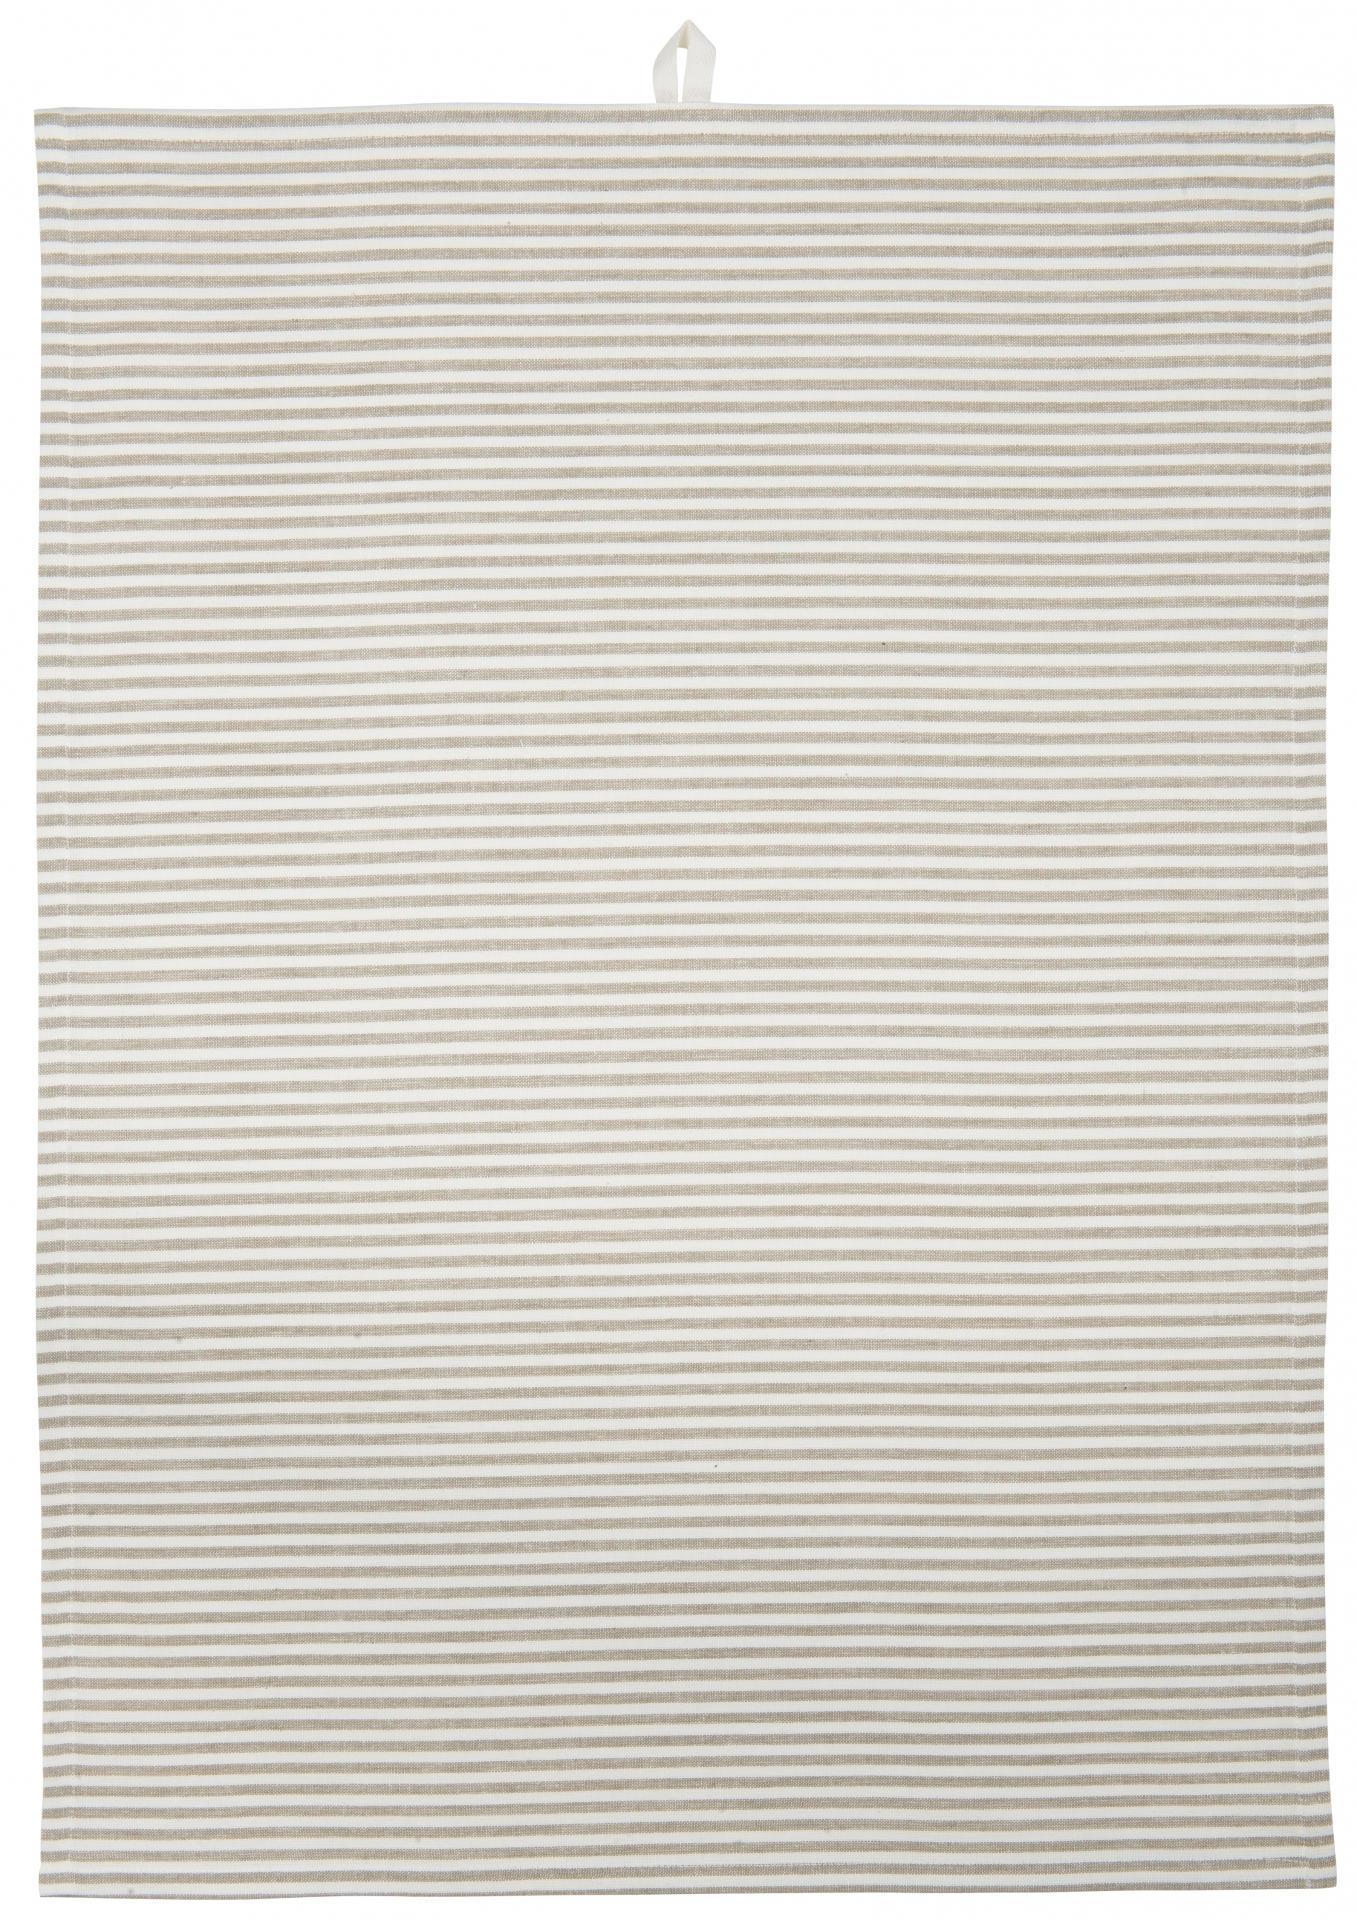 IB LAURSEN Utěrka Cream stripes